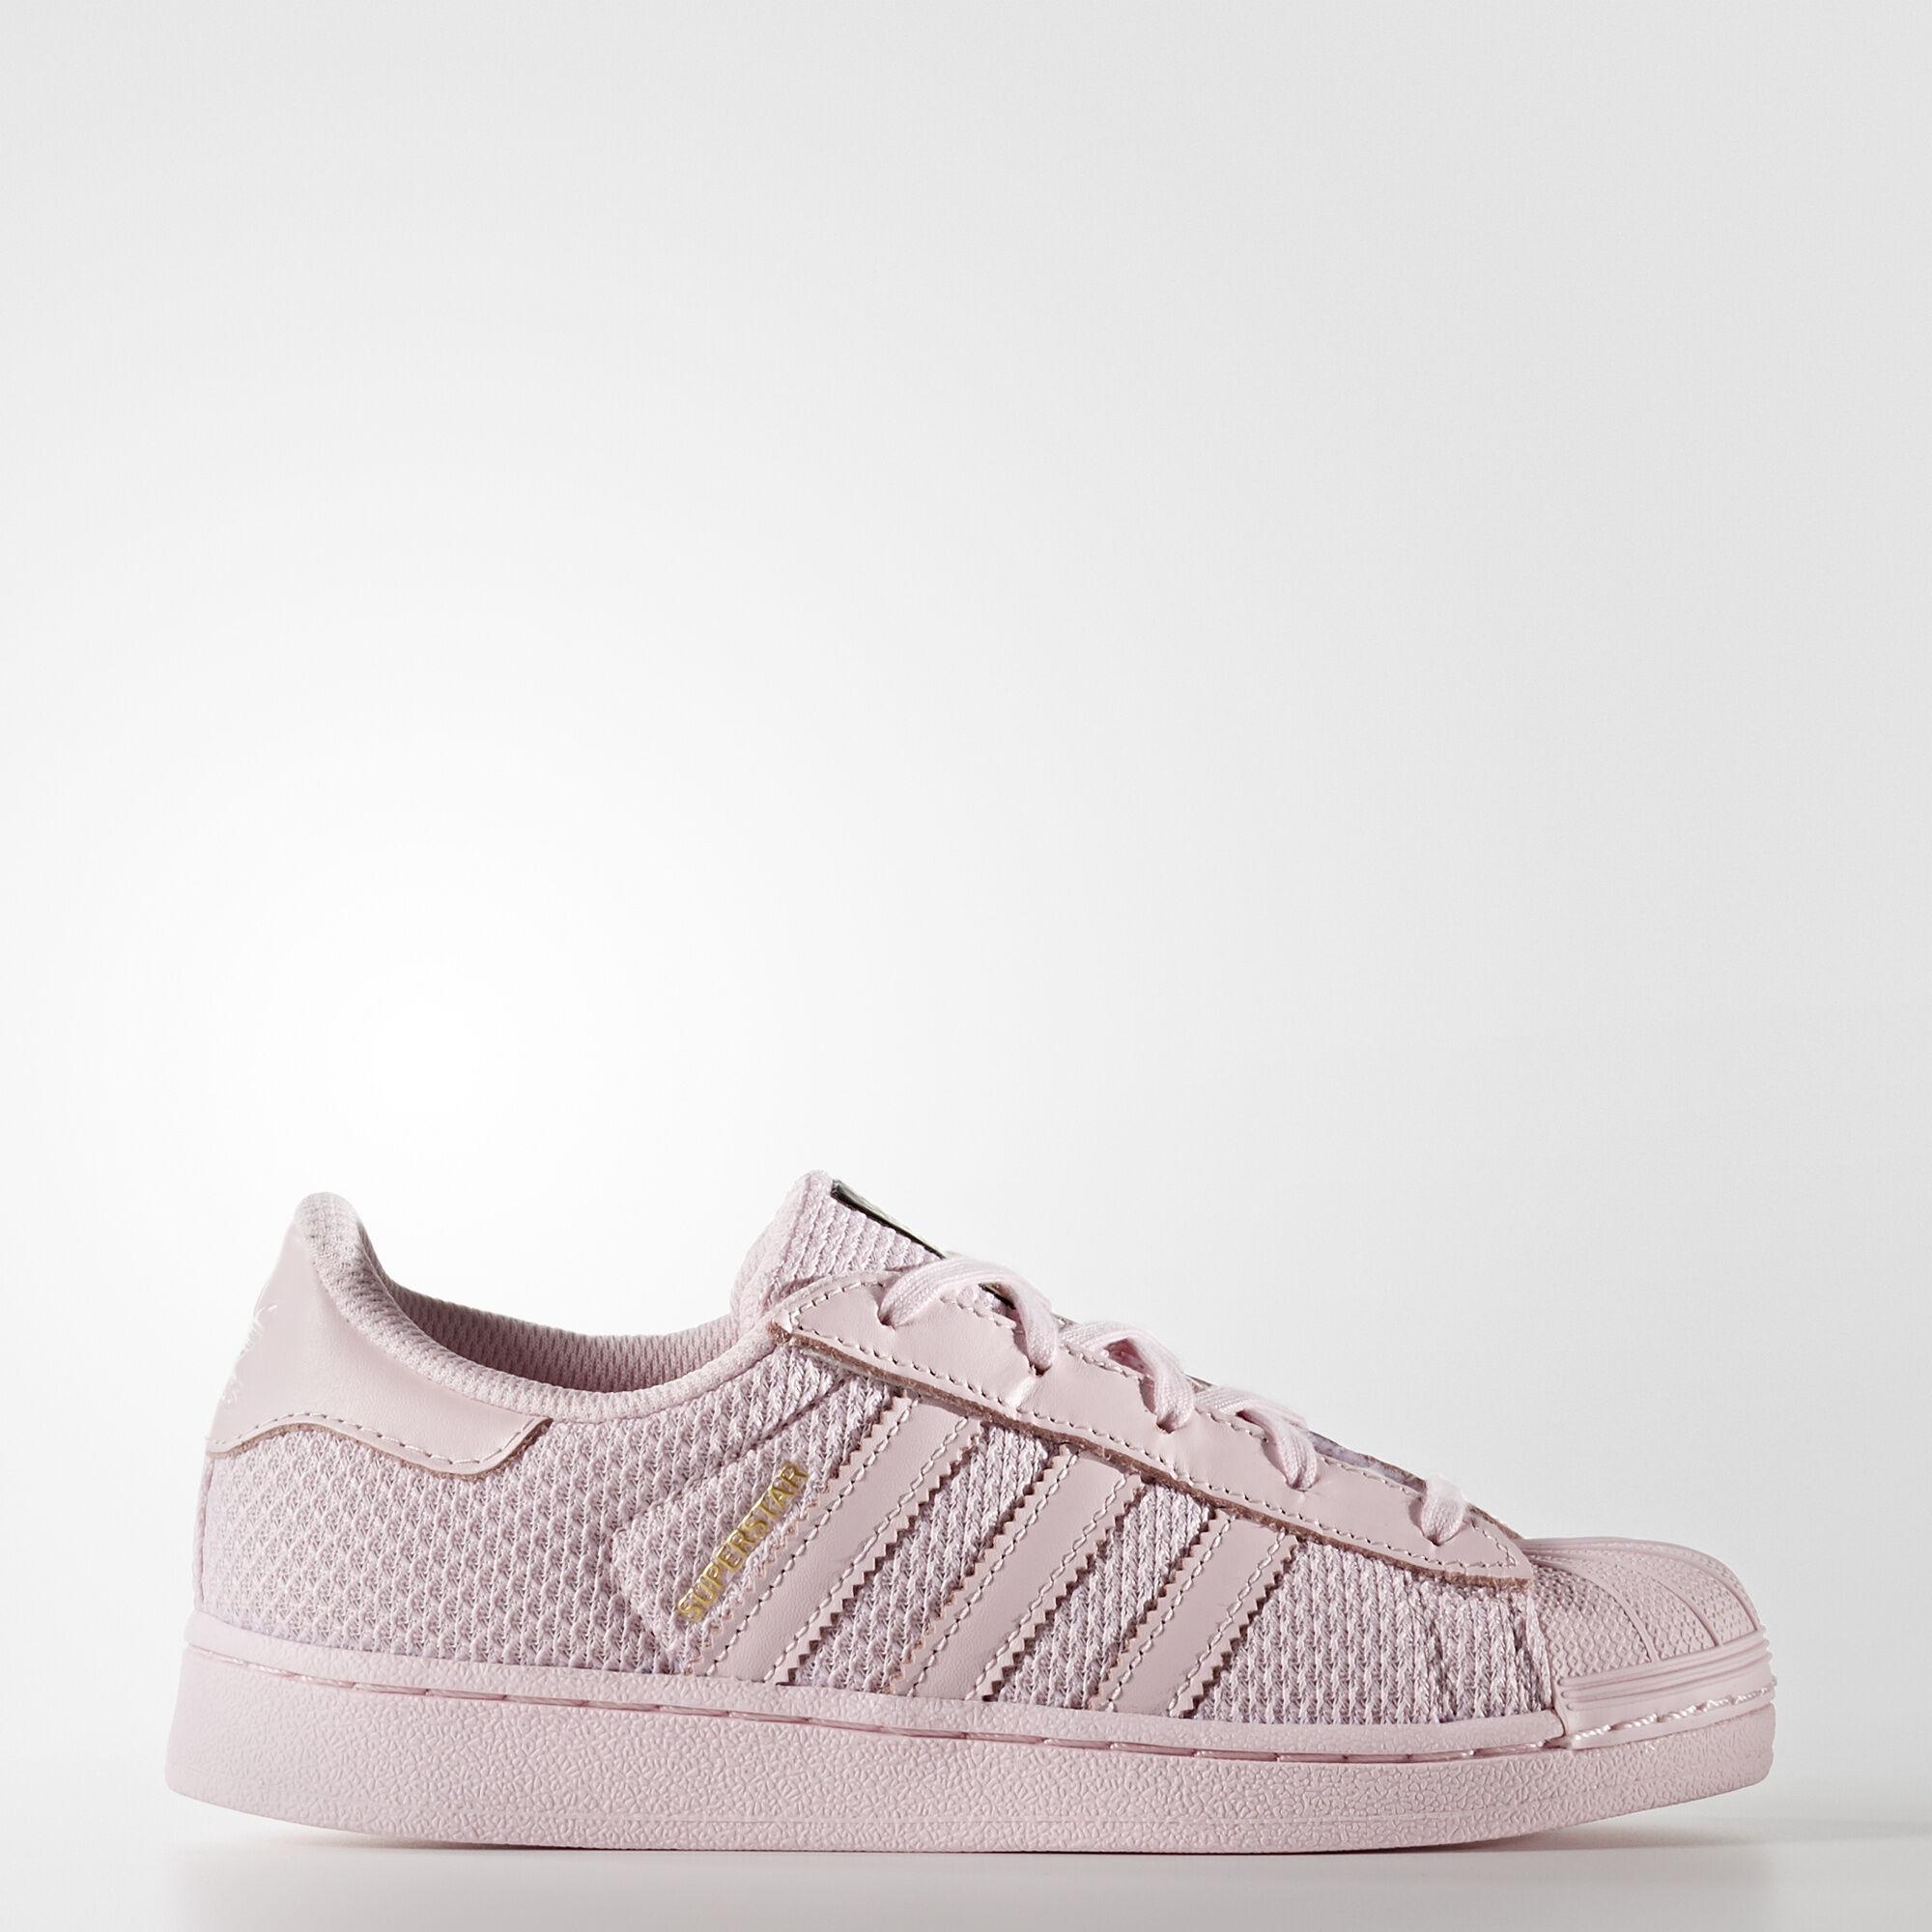 2adidas rosa claro